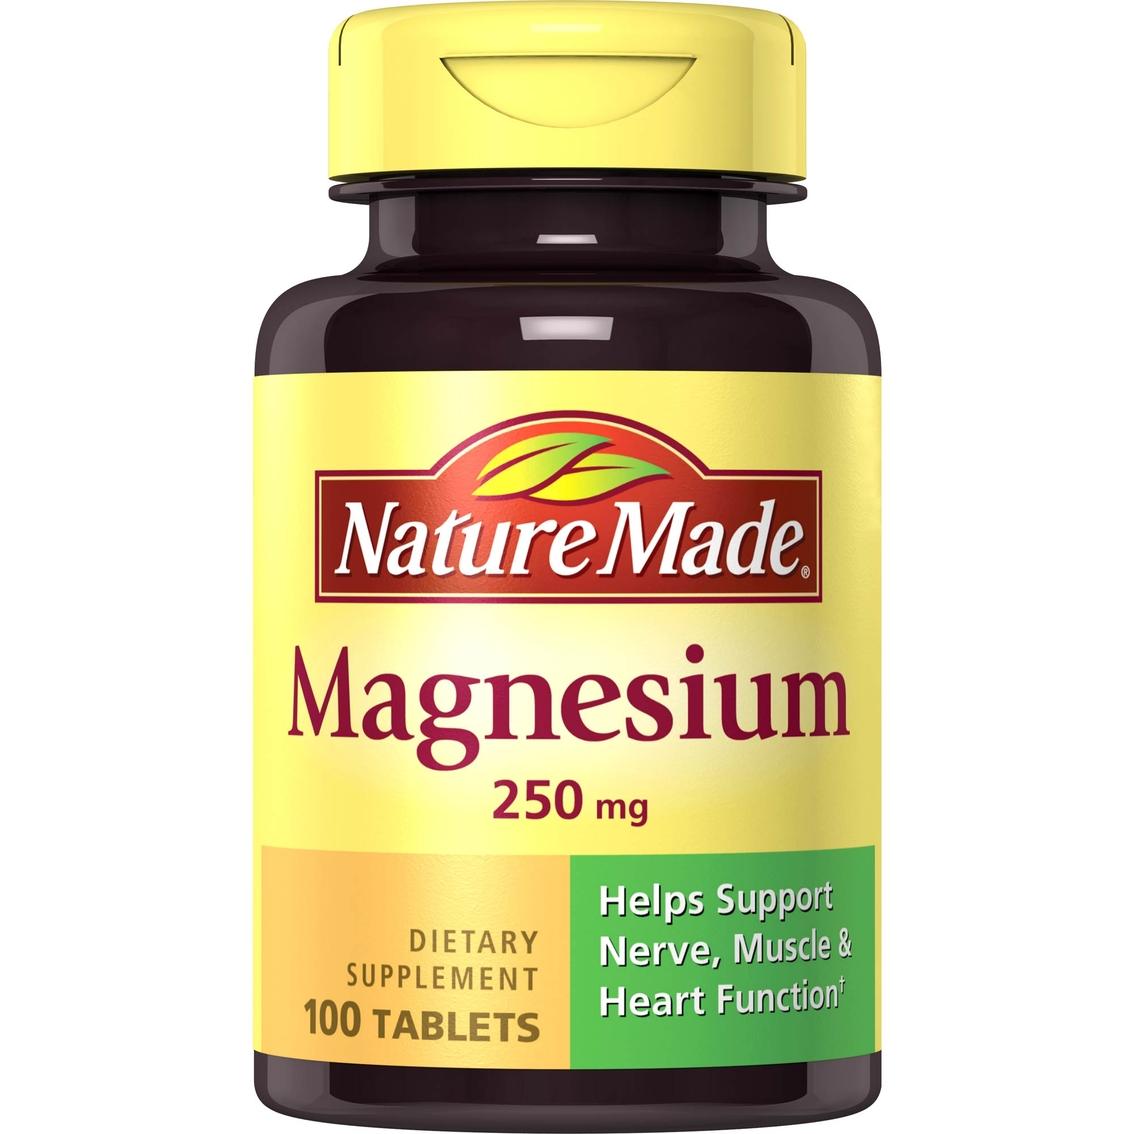 magnesium 250 mg nature tablets ct vitamins health shopmyexchange